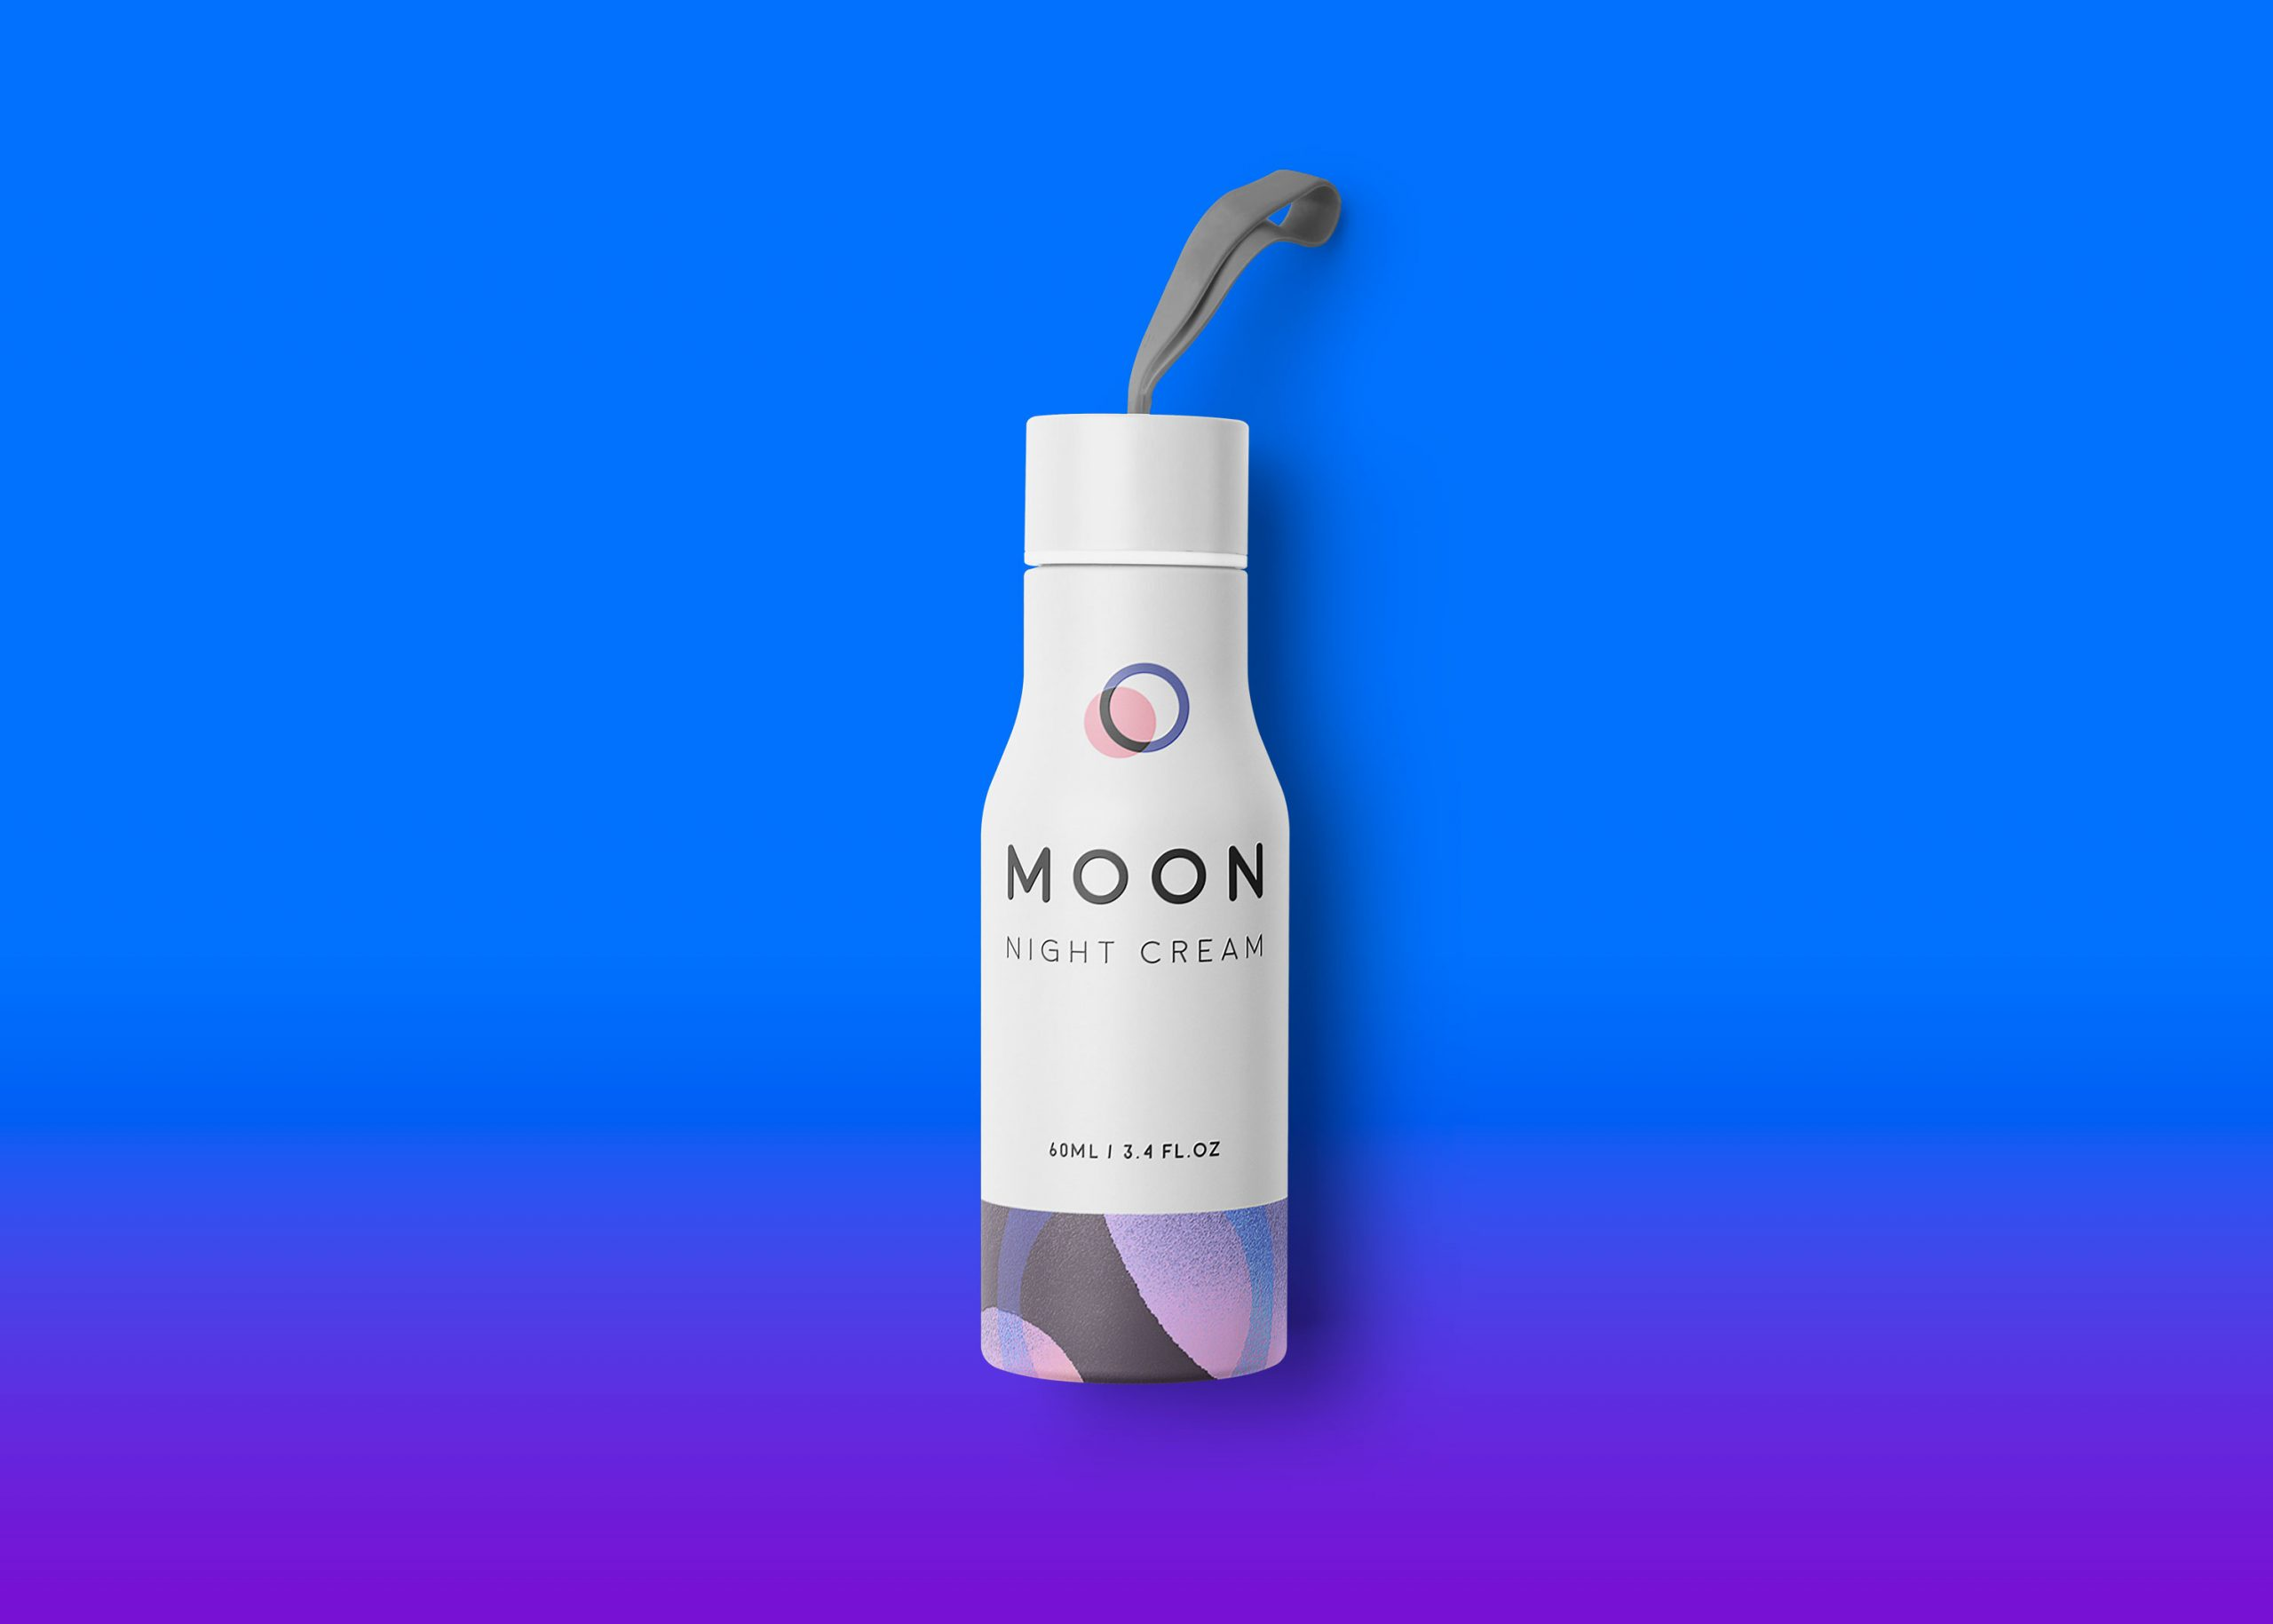 Freebies Small Premium Gym Water Bottle Mockup